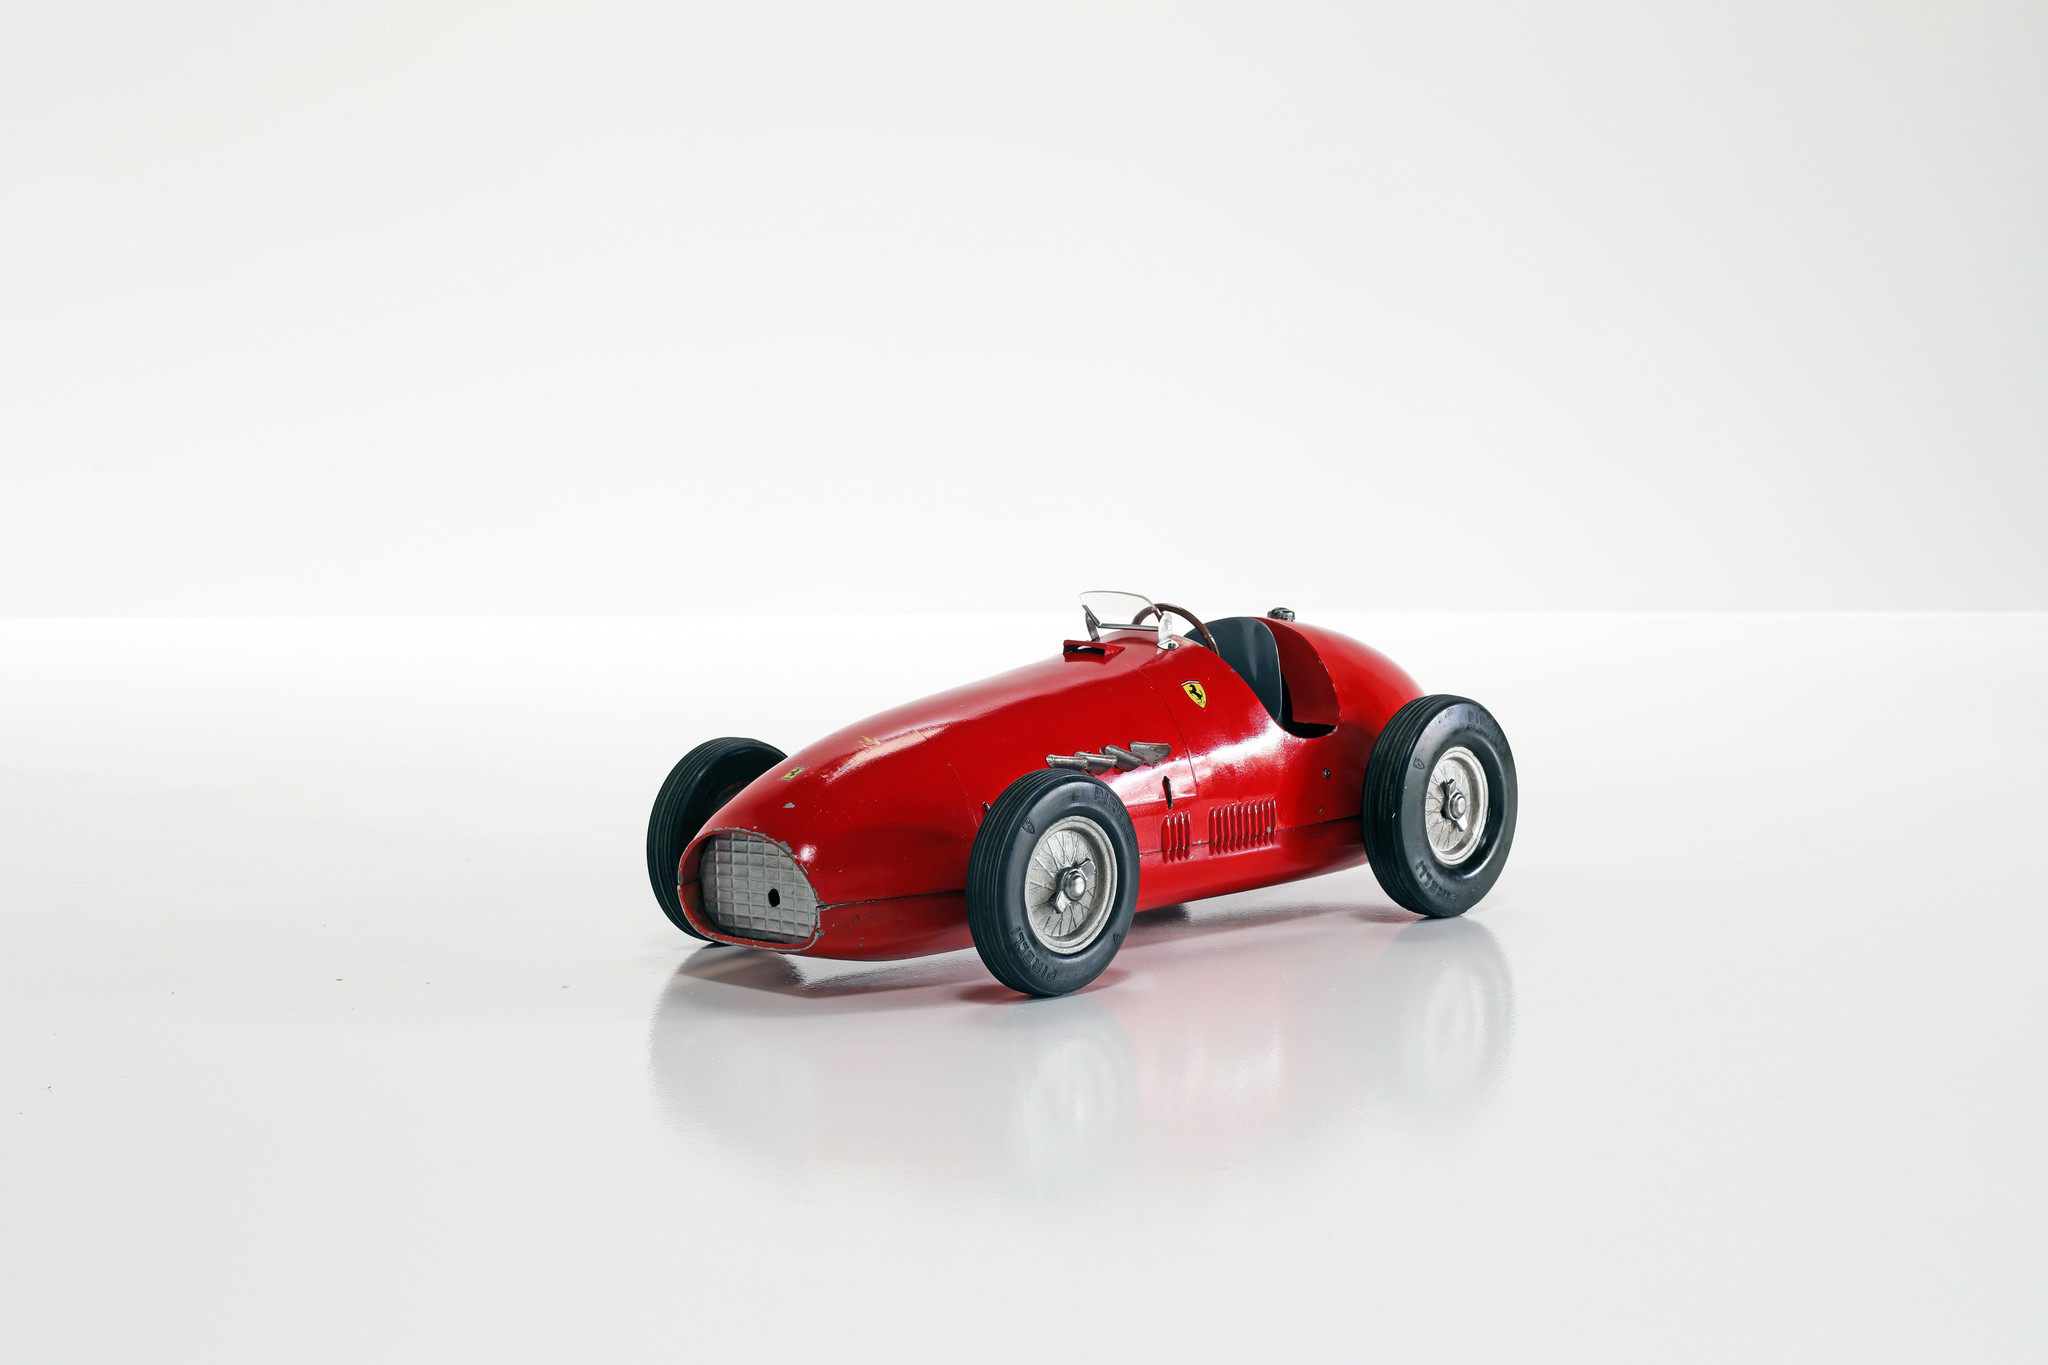 Ferrari F2 500  Toschi Marchesini, 1953